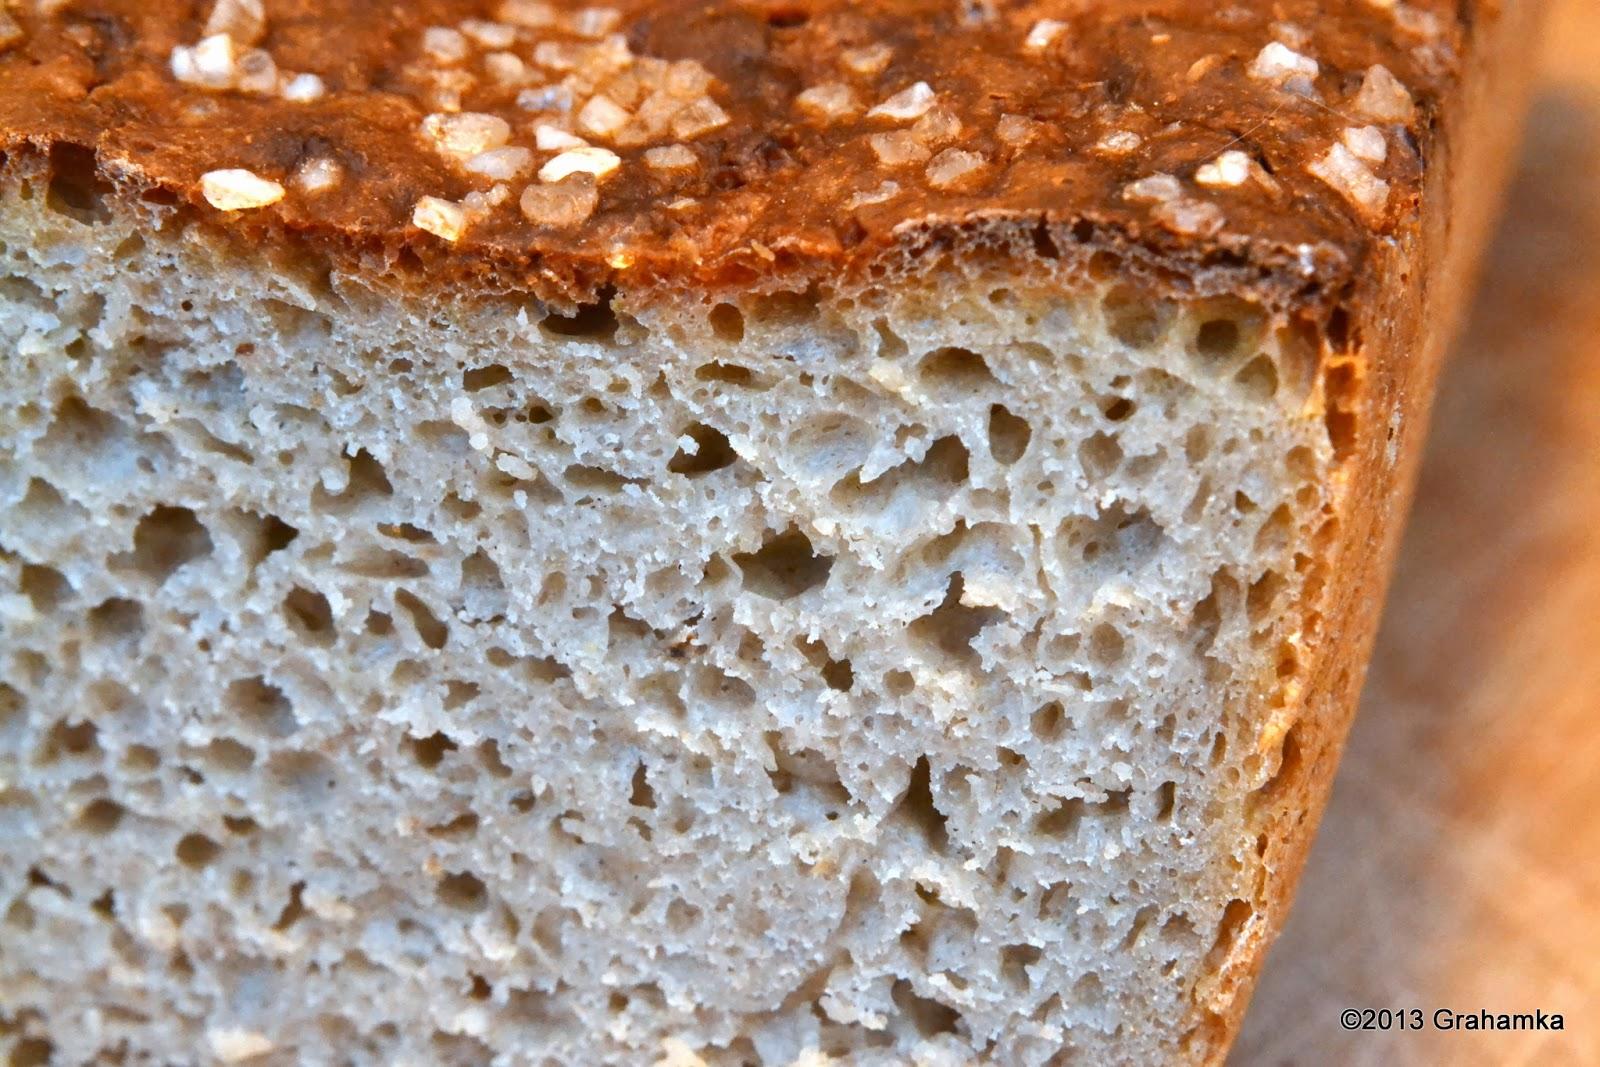 Chleb żytni, łatwy i szybki, z bliska.